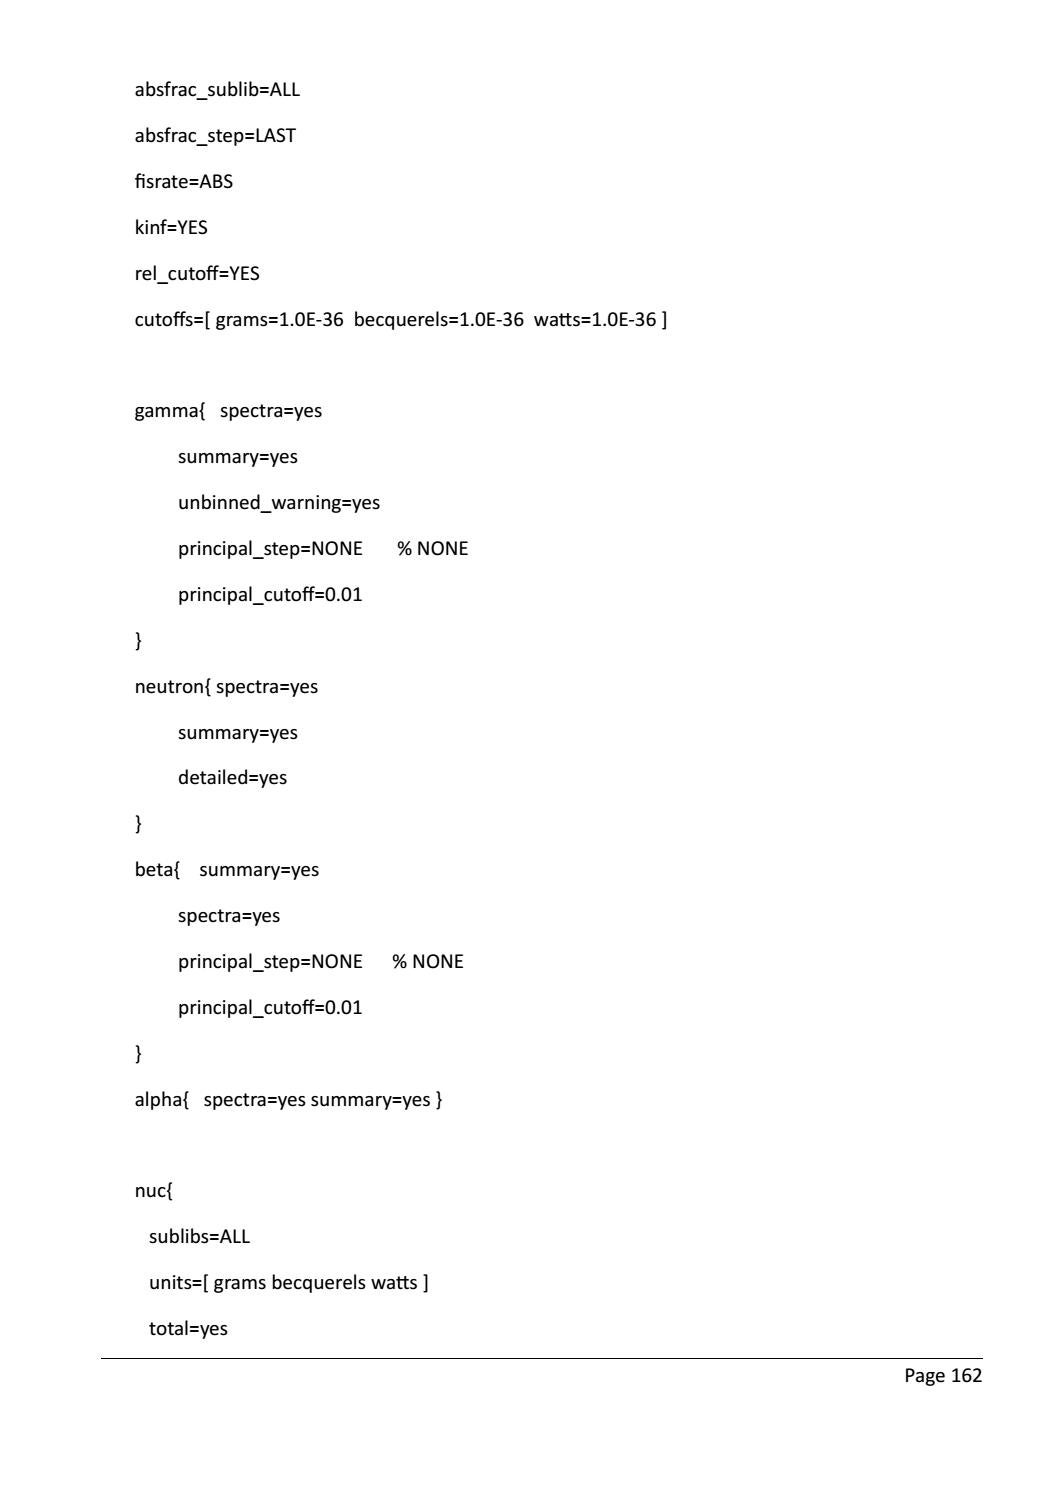 RADIOACTIVE WASTE: COMPUTATIONAL CHARACTERISATION and SHIELDING page 187